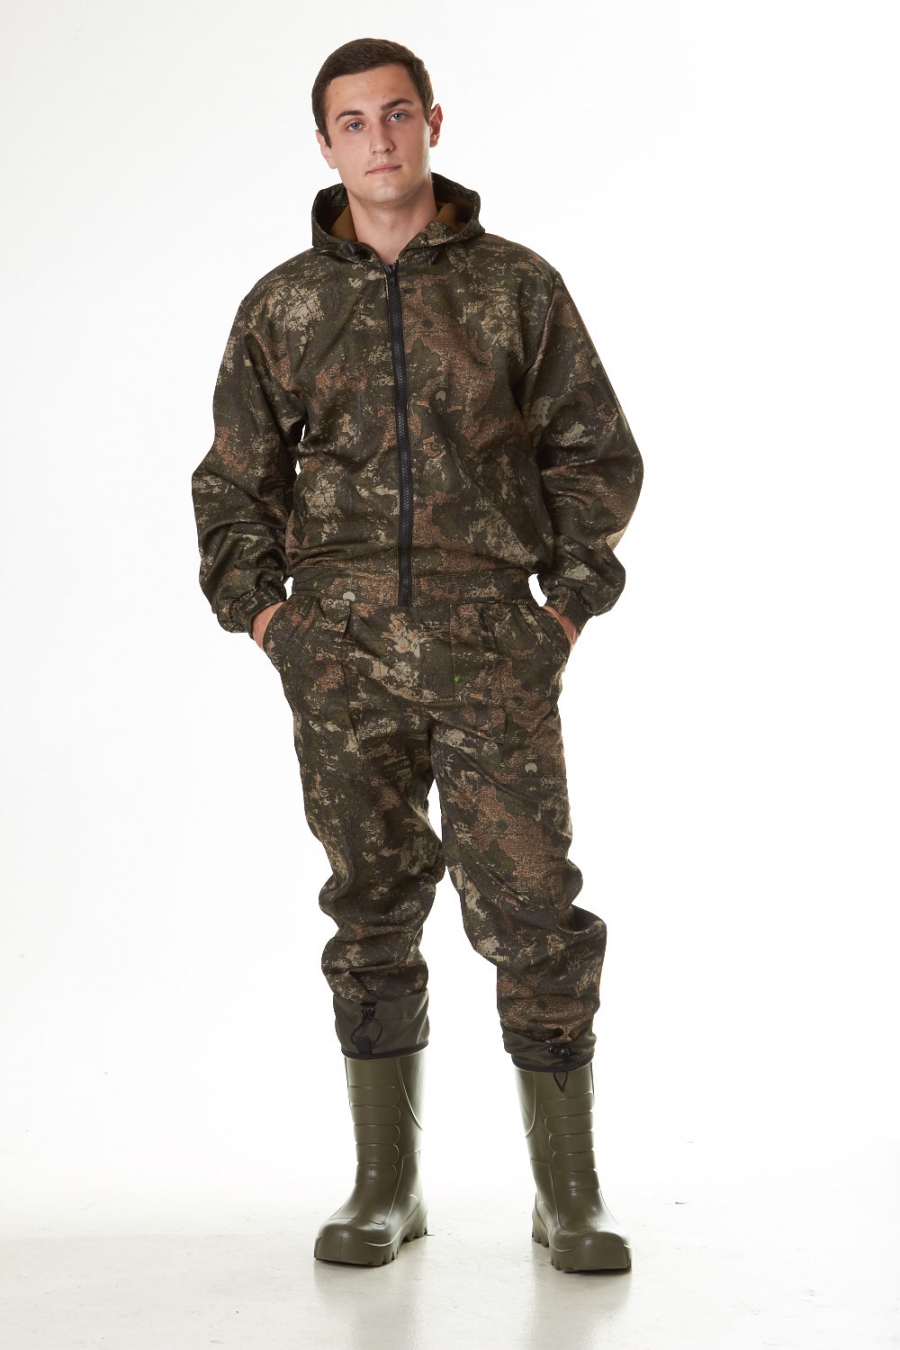 Костюм для охоты и рыбалки ЛесникОдежда для охоты и рыбалки<br><br><br>Размер: 52